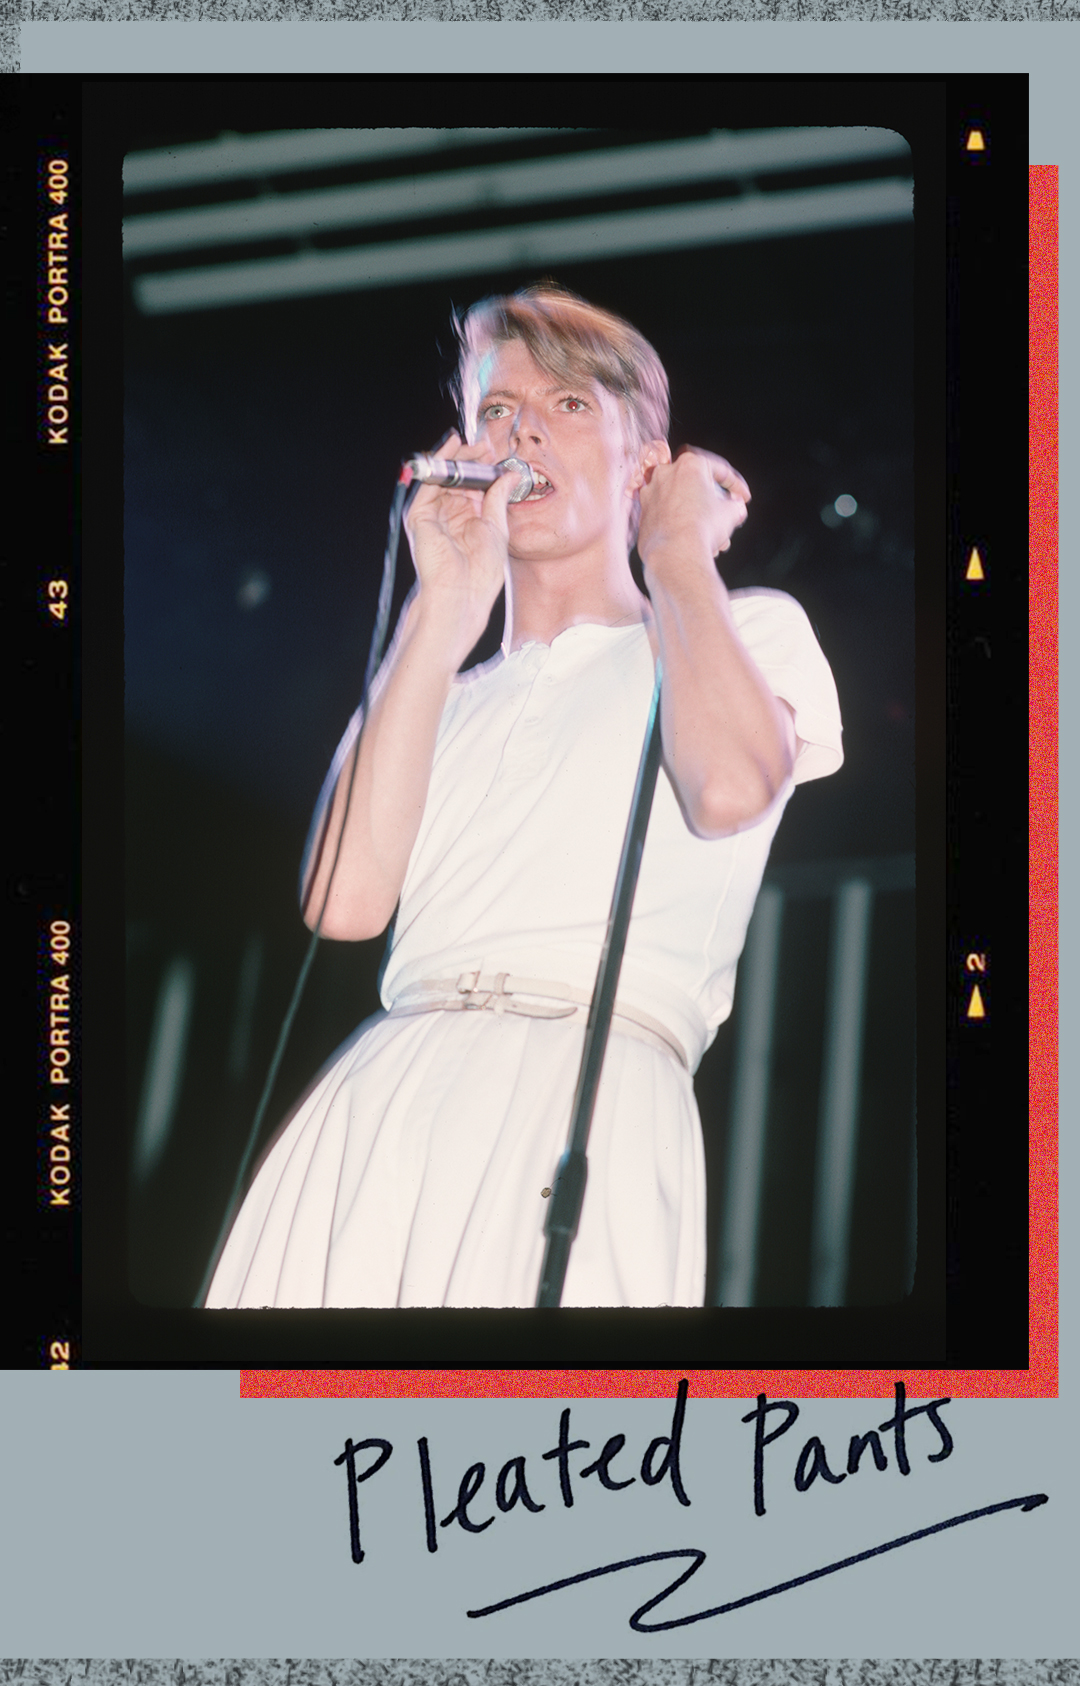 On John's Radar: 3 Vintage-Inspired Looks